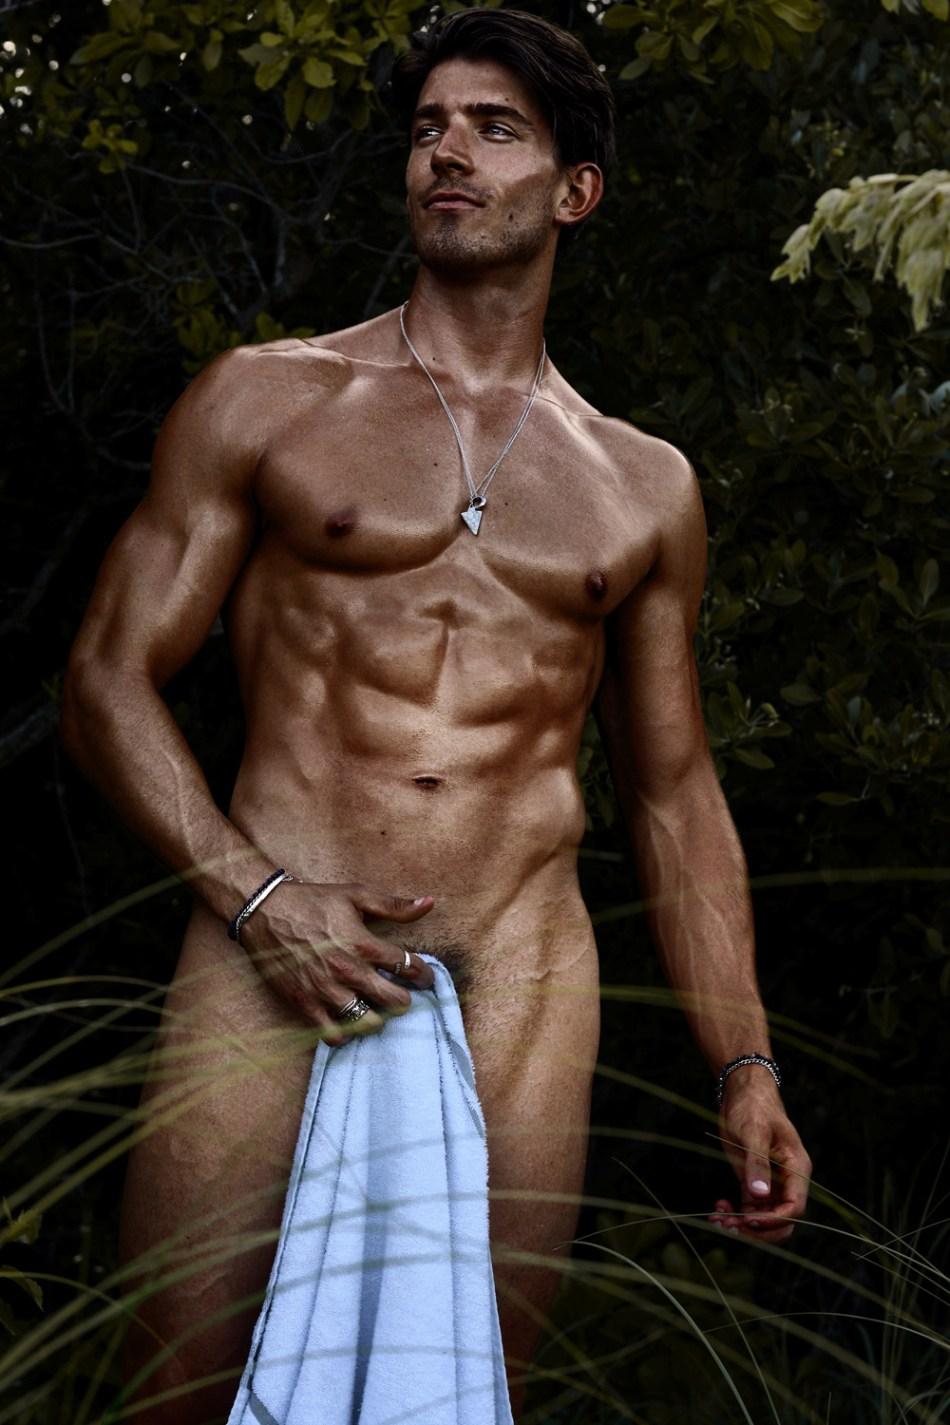 Payton Clarke by Stevan Reyes5